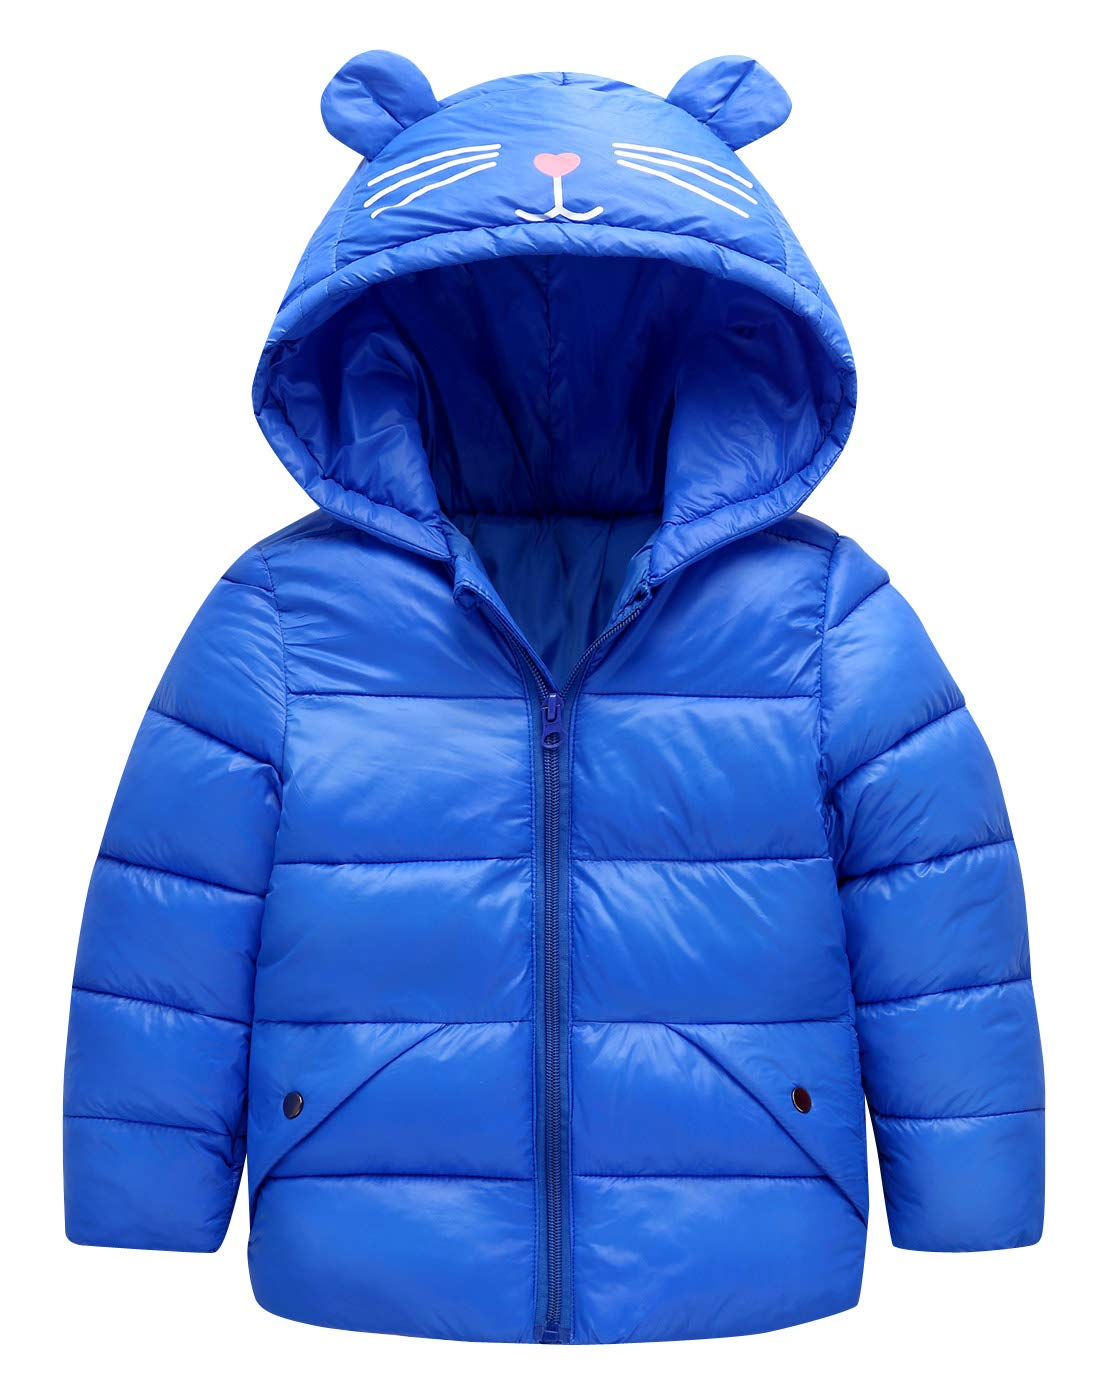 Happy Cherry Baby Boys Girls Hooded Down Jacket Windproof Warm Snowsuit Winter Coat